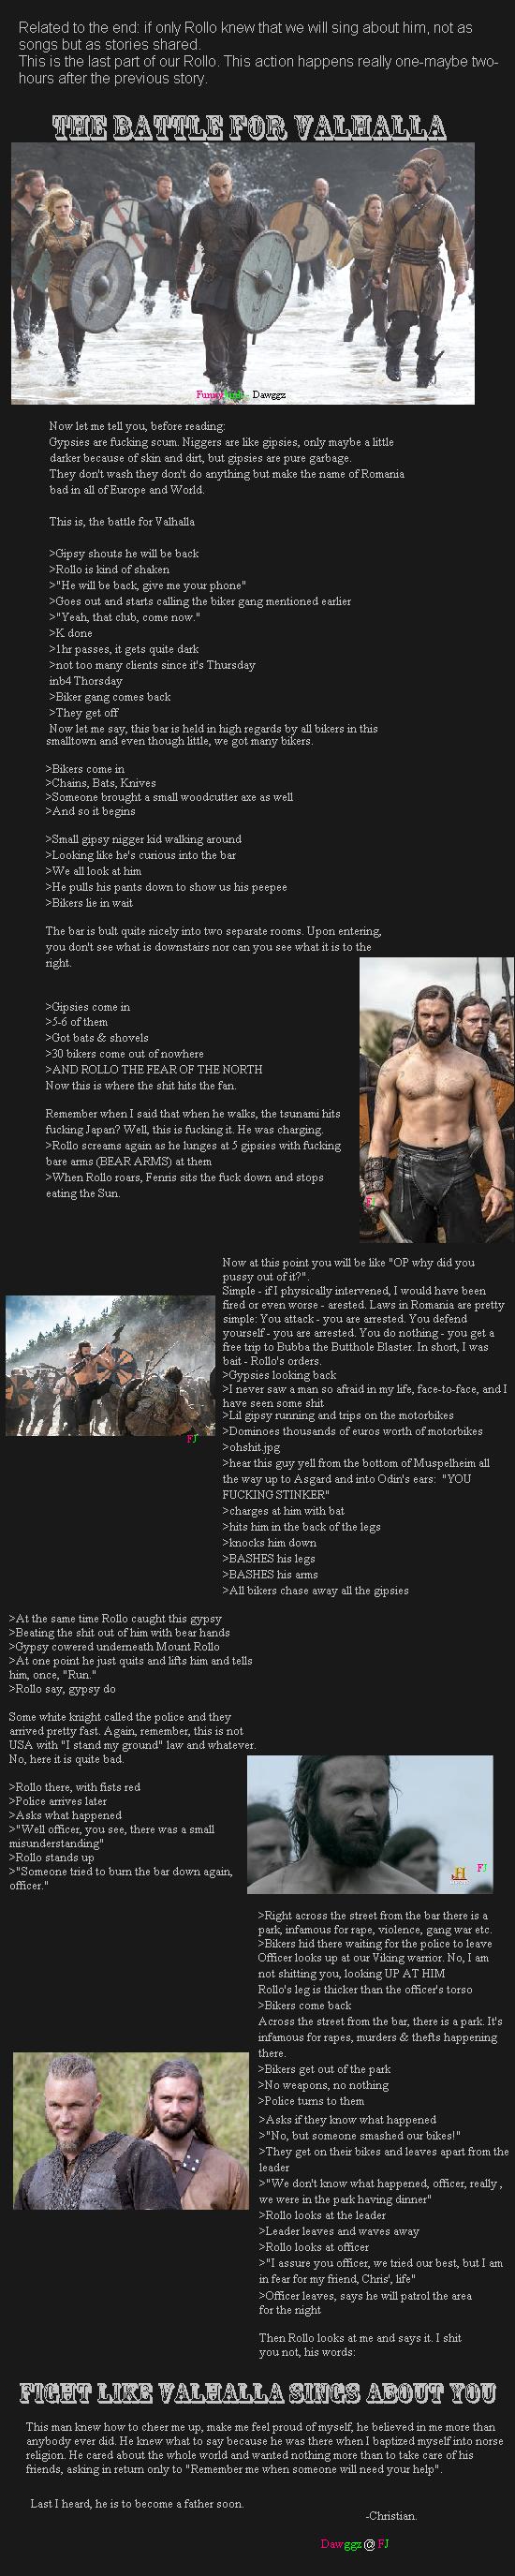 Rollo 4: The Battle for Valhalla. Worth. Part 1: /Bar+adventures+please+read+description/funny-p... Part 2: /Rollo+2+read+description/funny-pictures/5131629/ Pa Rollo beast Mode viking warrior VALHALLA odin aint Got shit